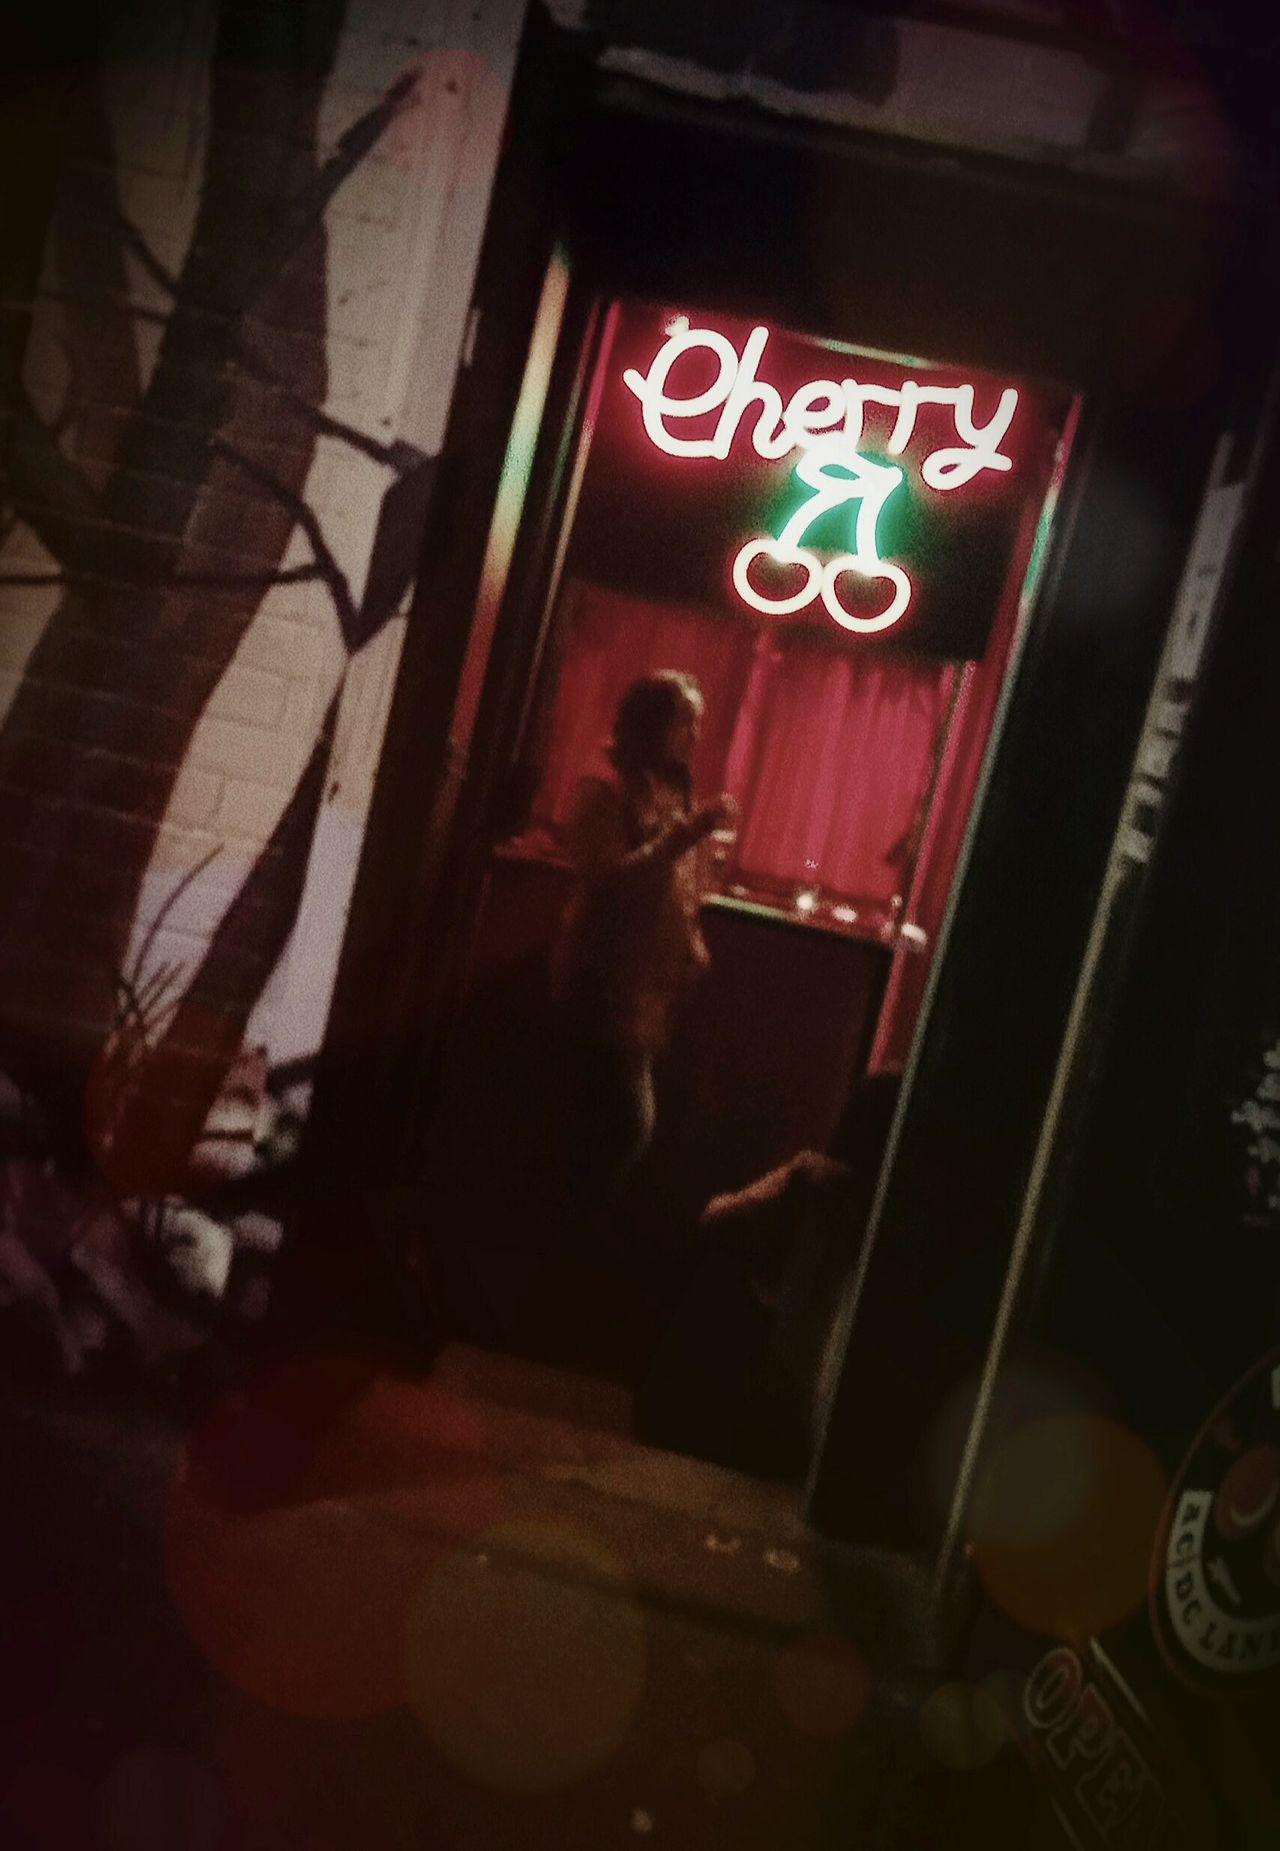 Bar Cherry Nightlife